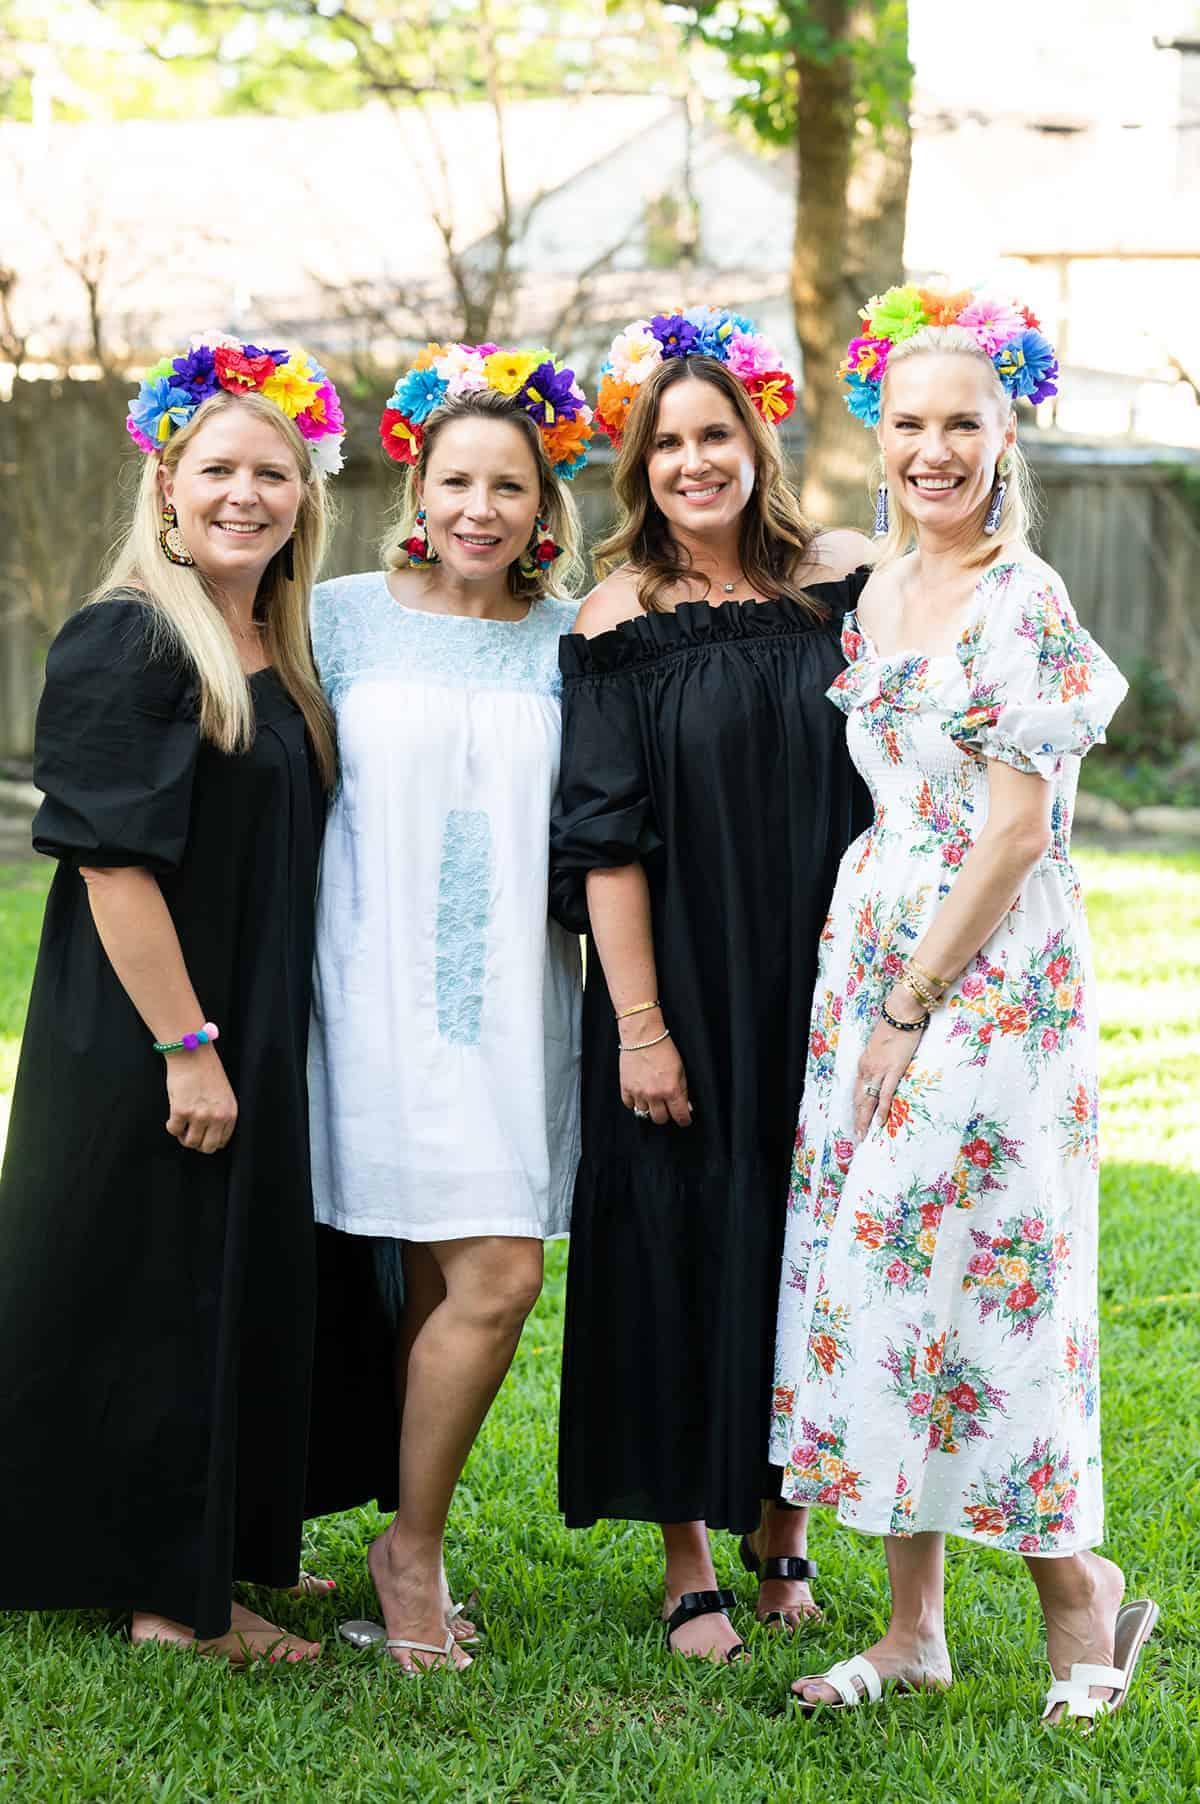 Cece Griffin, Ana Leah Montemayor, Amelita Mauze_ and Emilie Petty